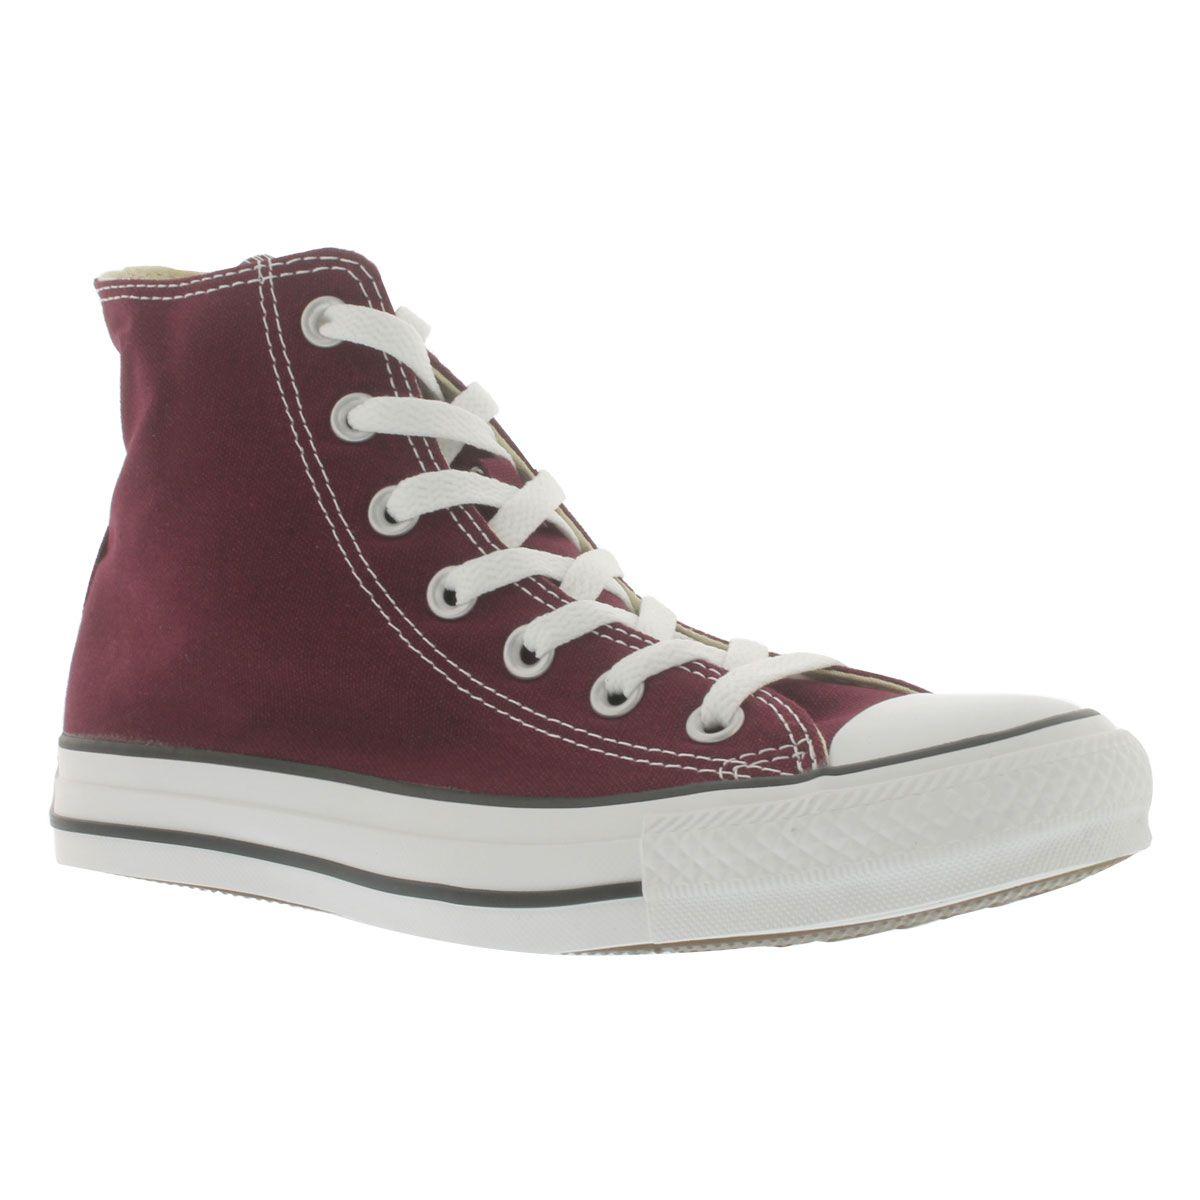 10fd146d4230e7 Converse Women s CT ALL STAR SEASONAL burgundy sneakers 139784C ...